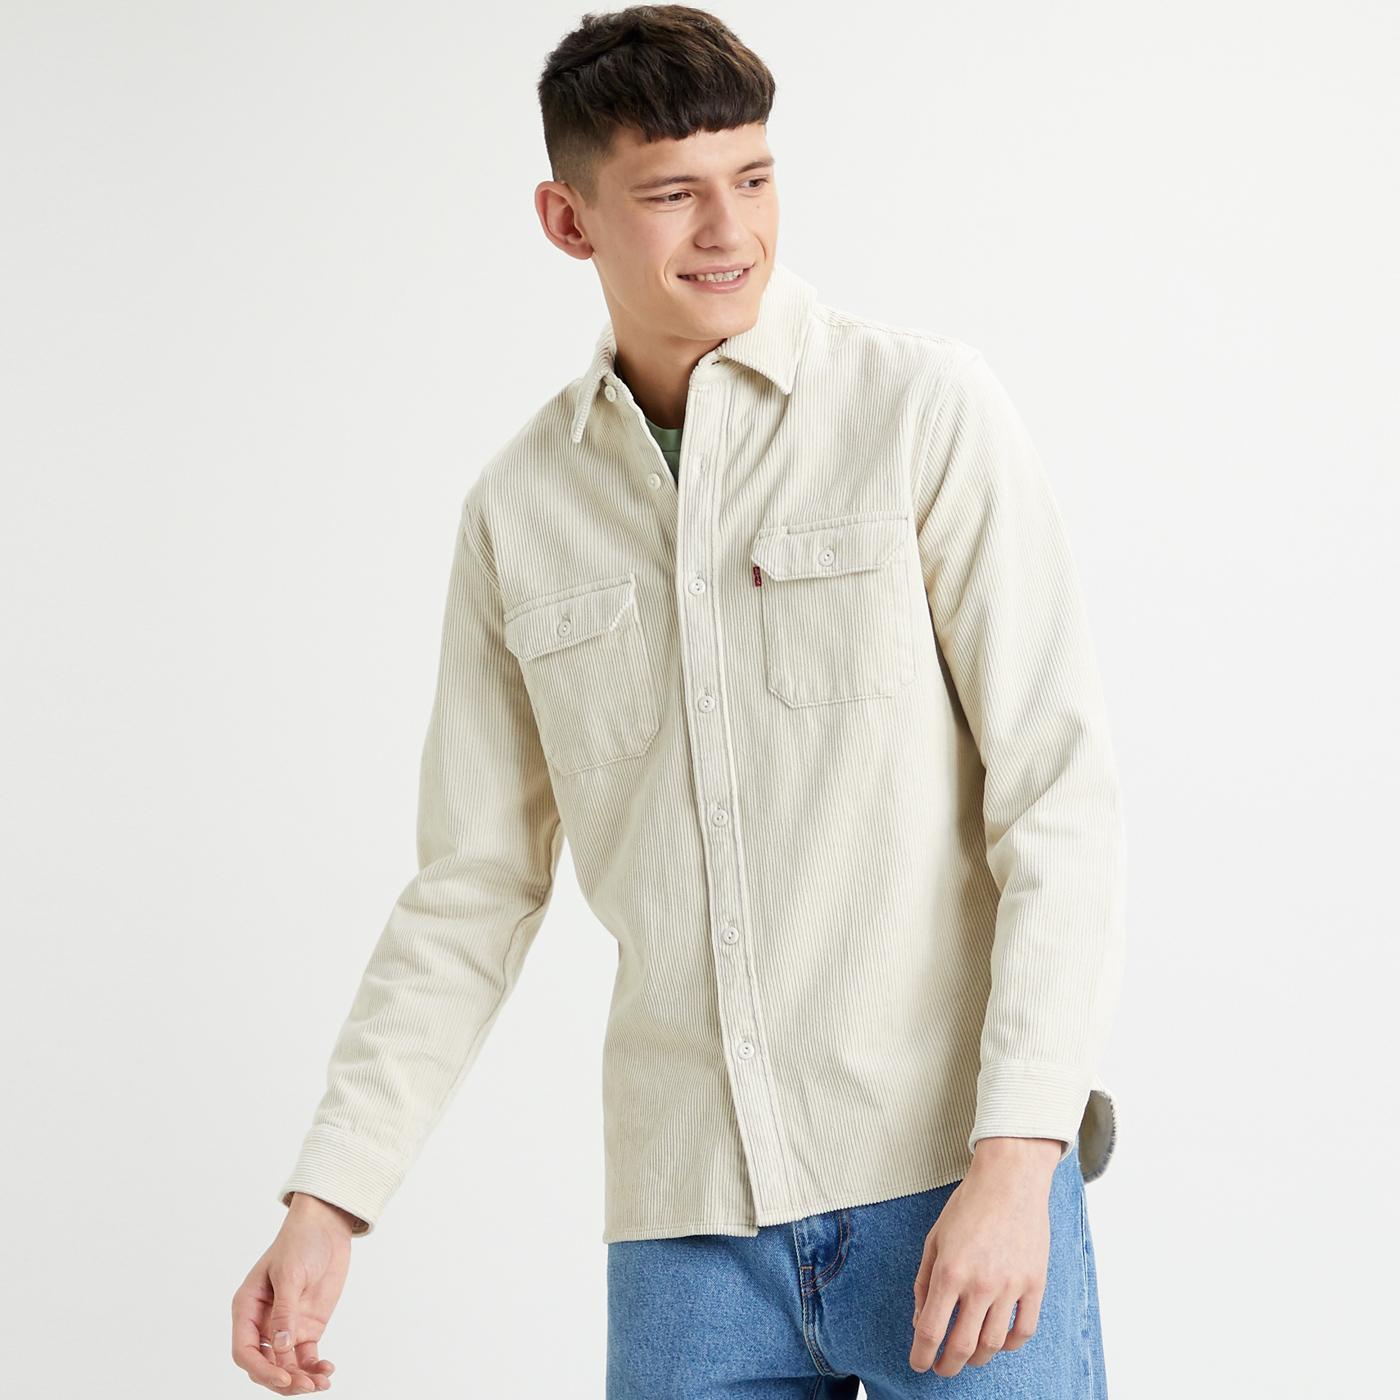 Jackson LEVI'S Retro Cord Worker Over Shirt (AM)